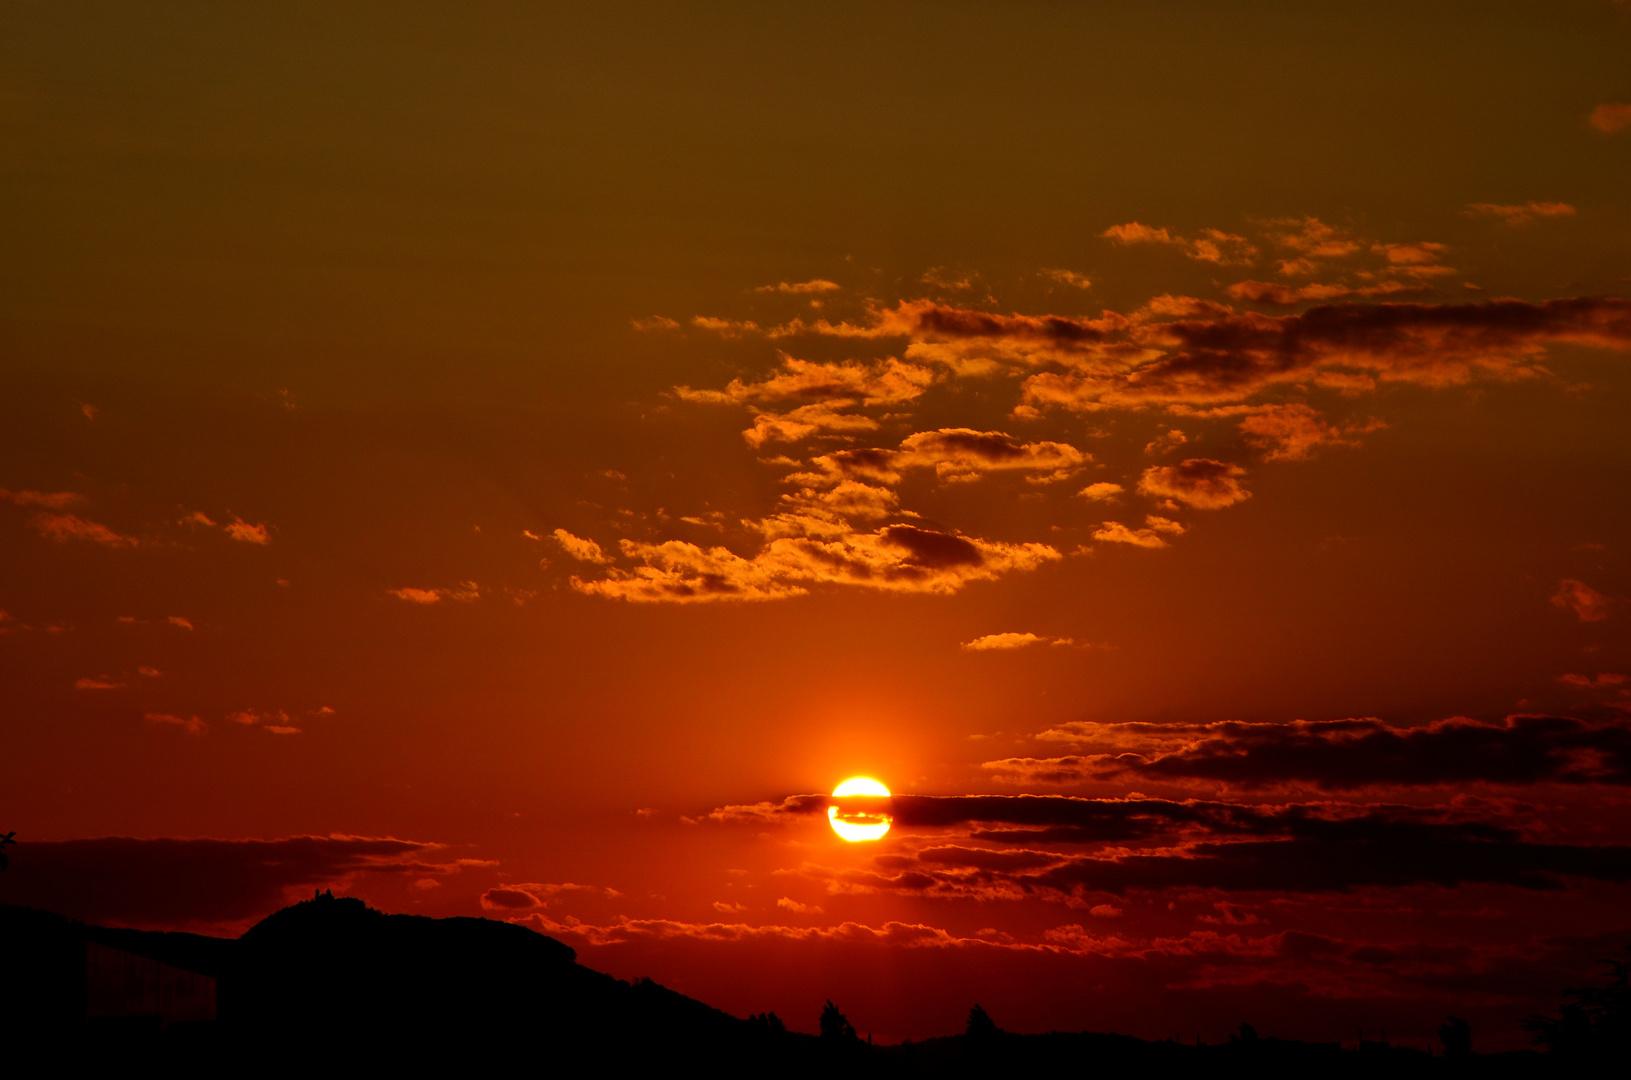 Blutroter Sonnenuntergang.